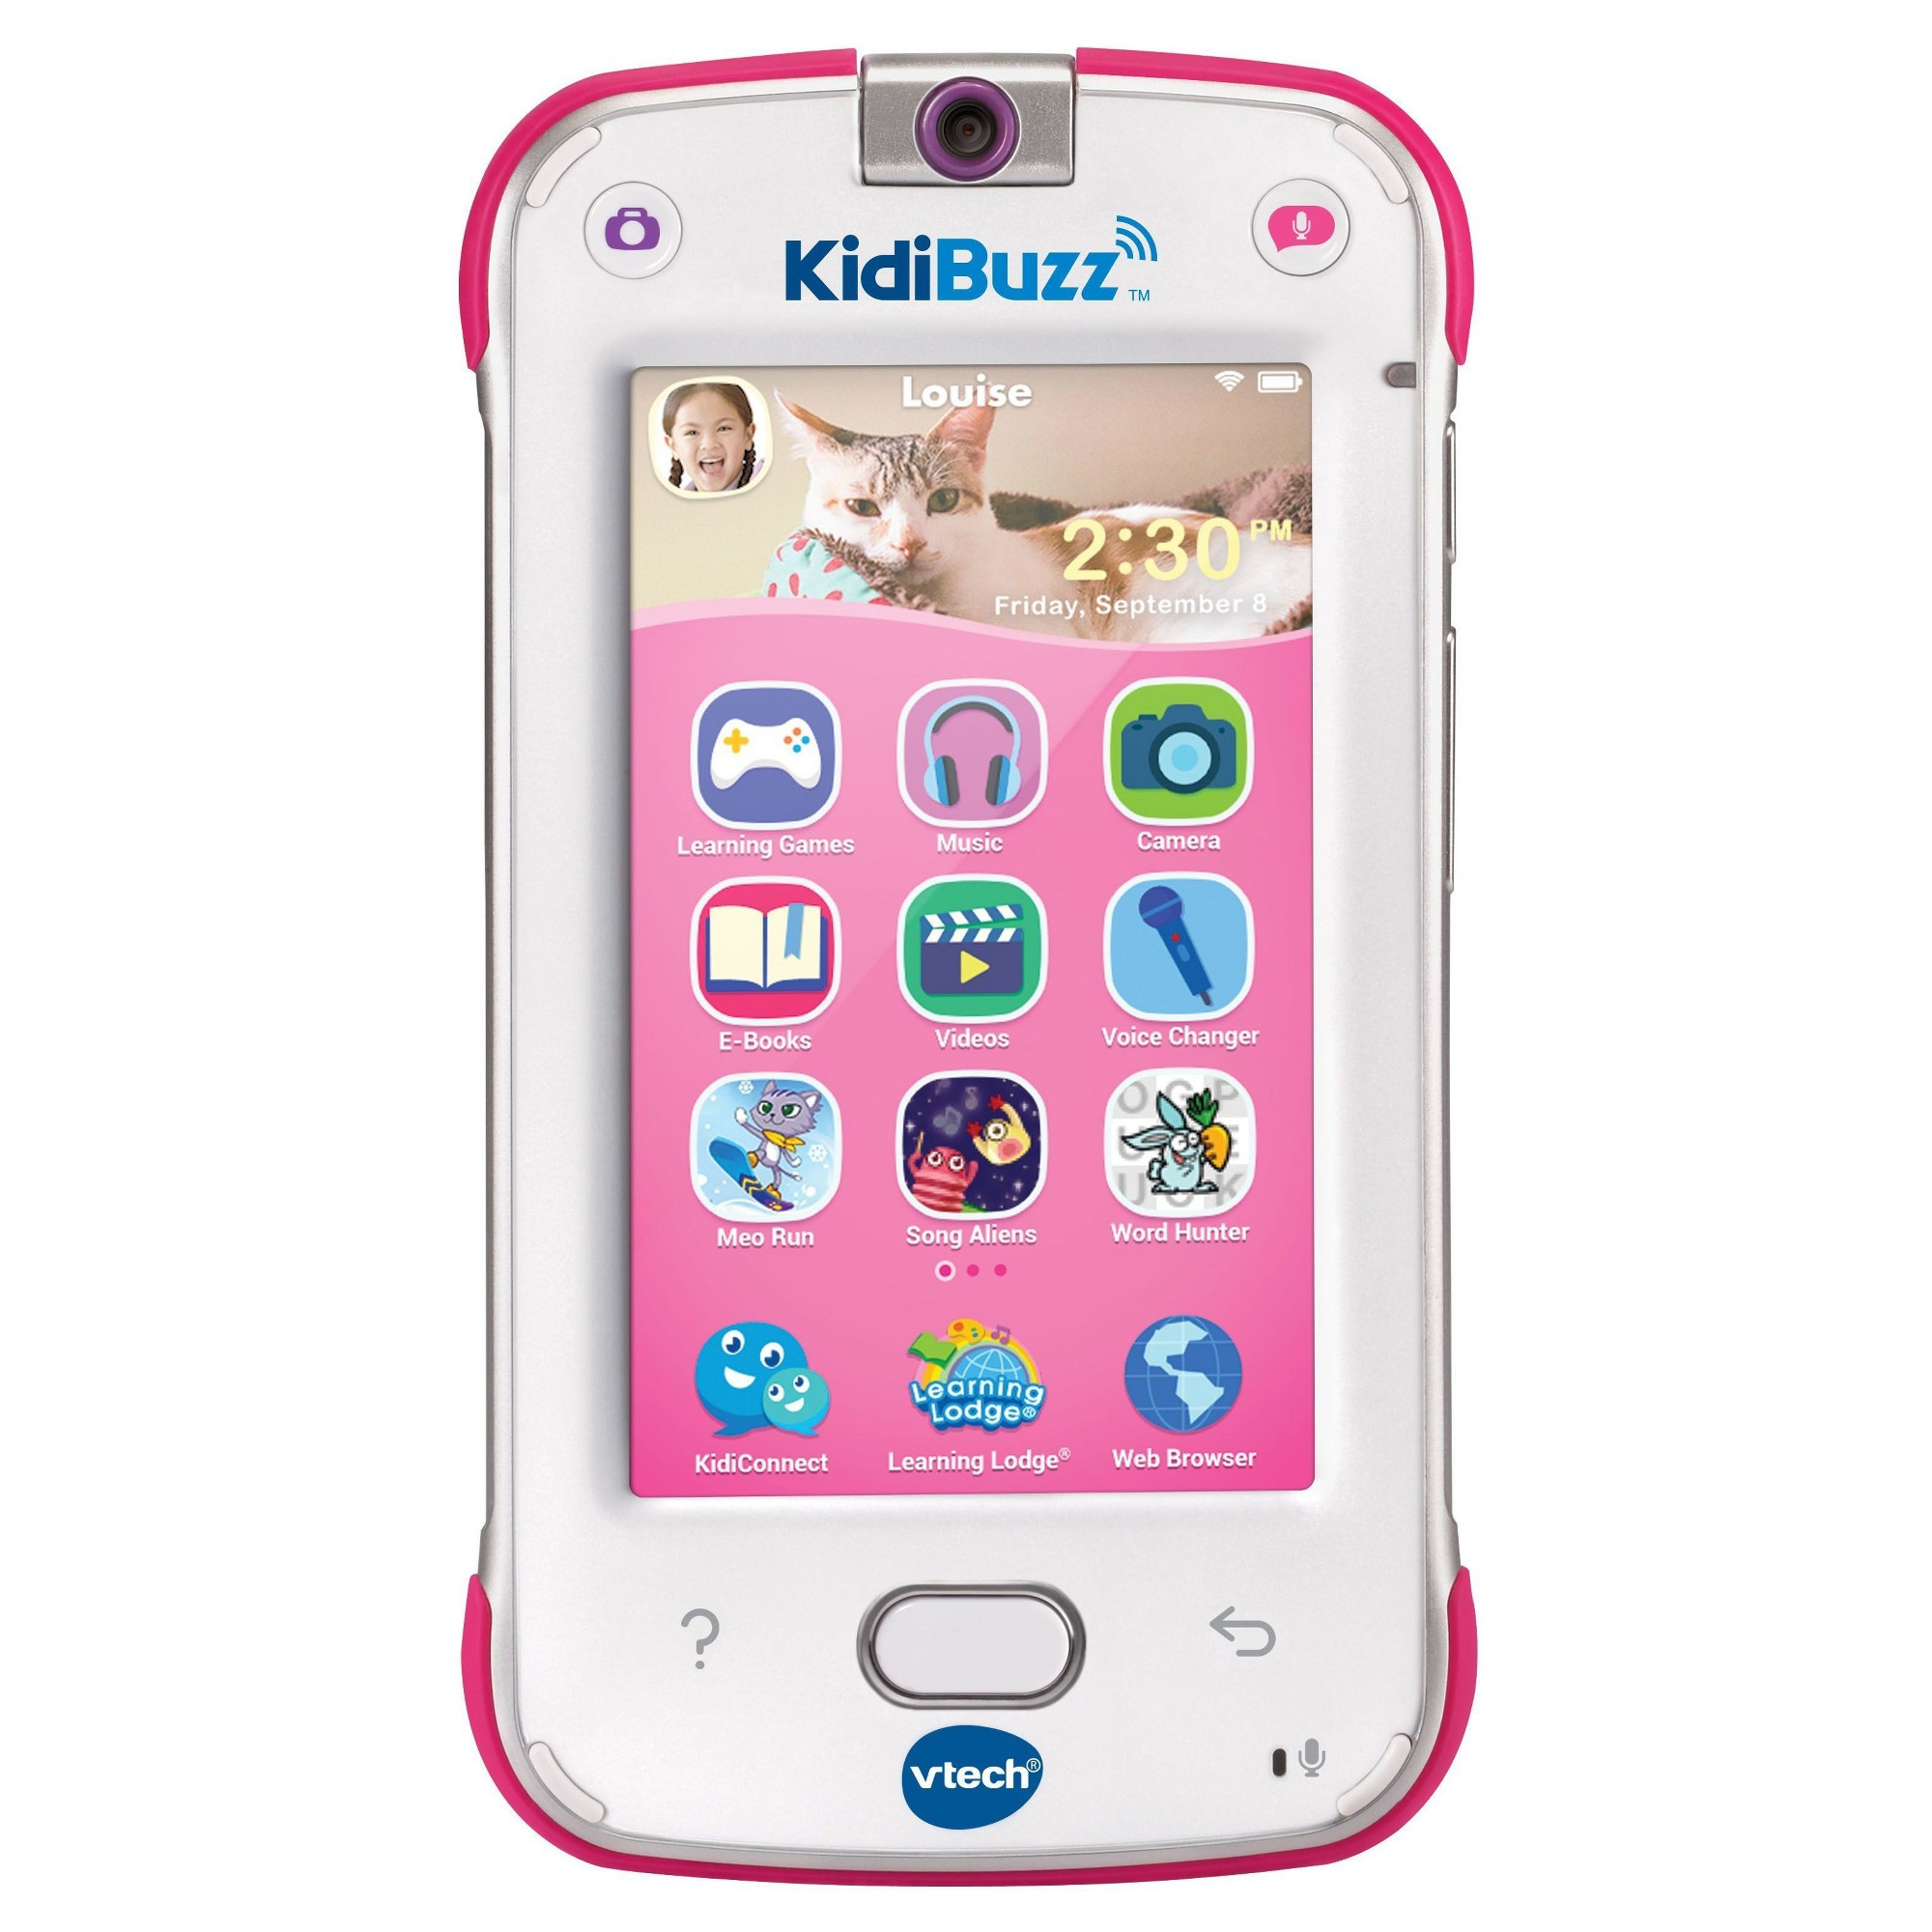 VTech Kidibuzz Pink Smart device, Toys for girls, Kids